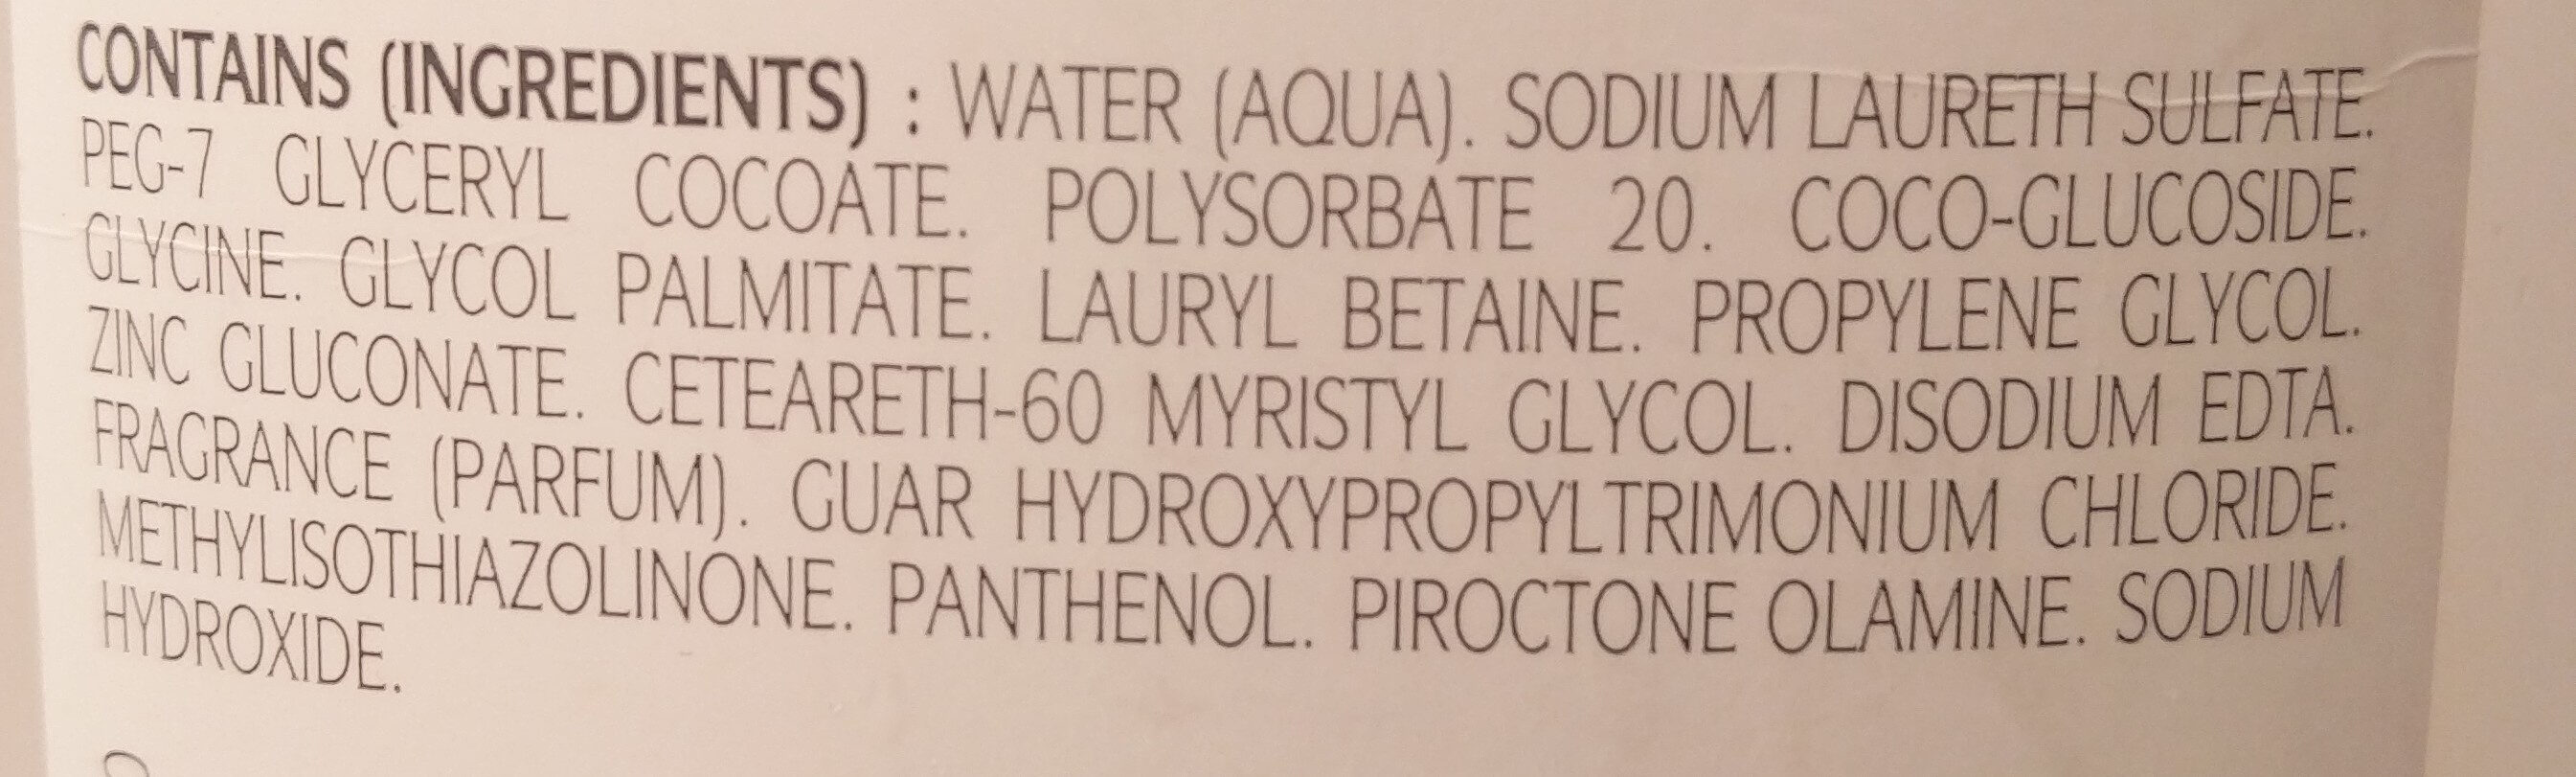 Elution - shampooing traitant dermo-protecteur - Ingredients - fr